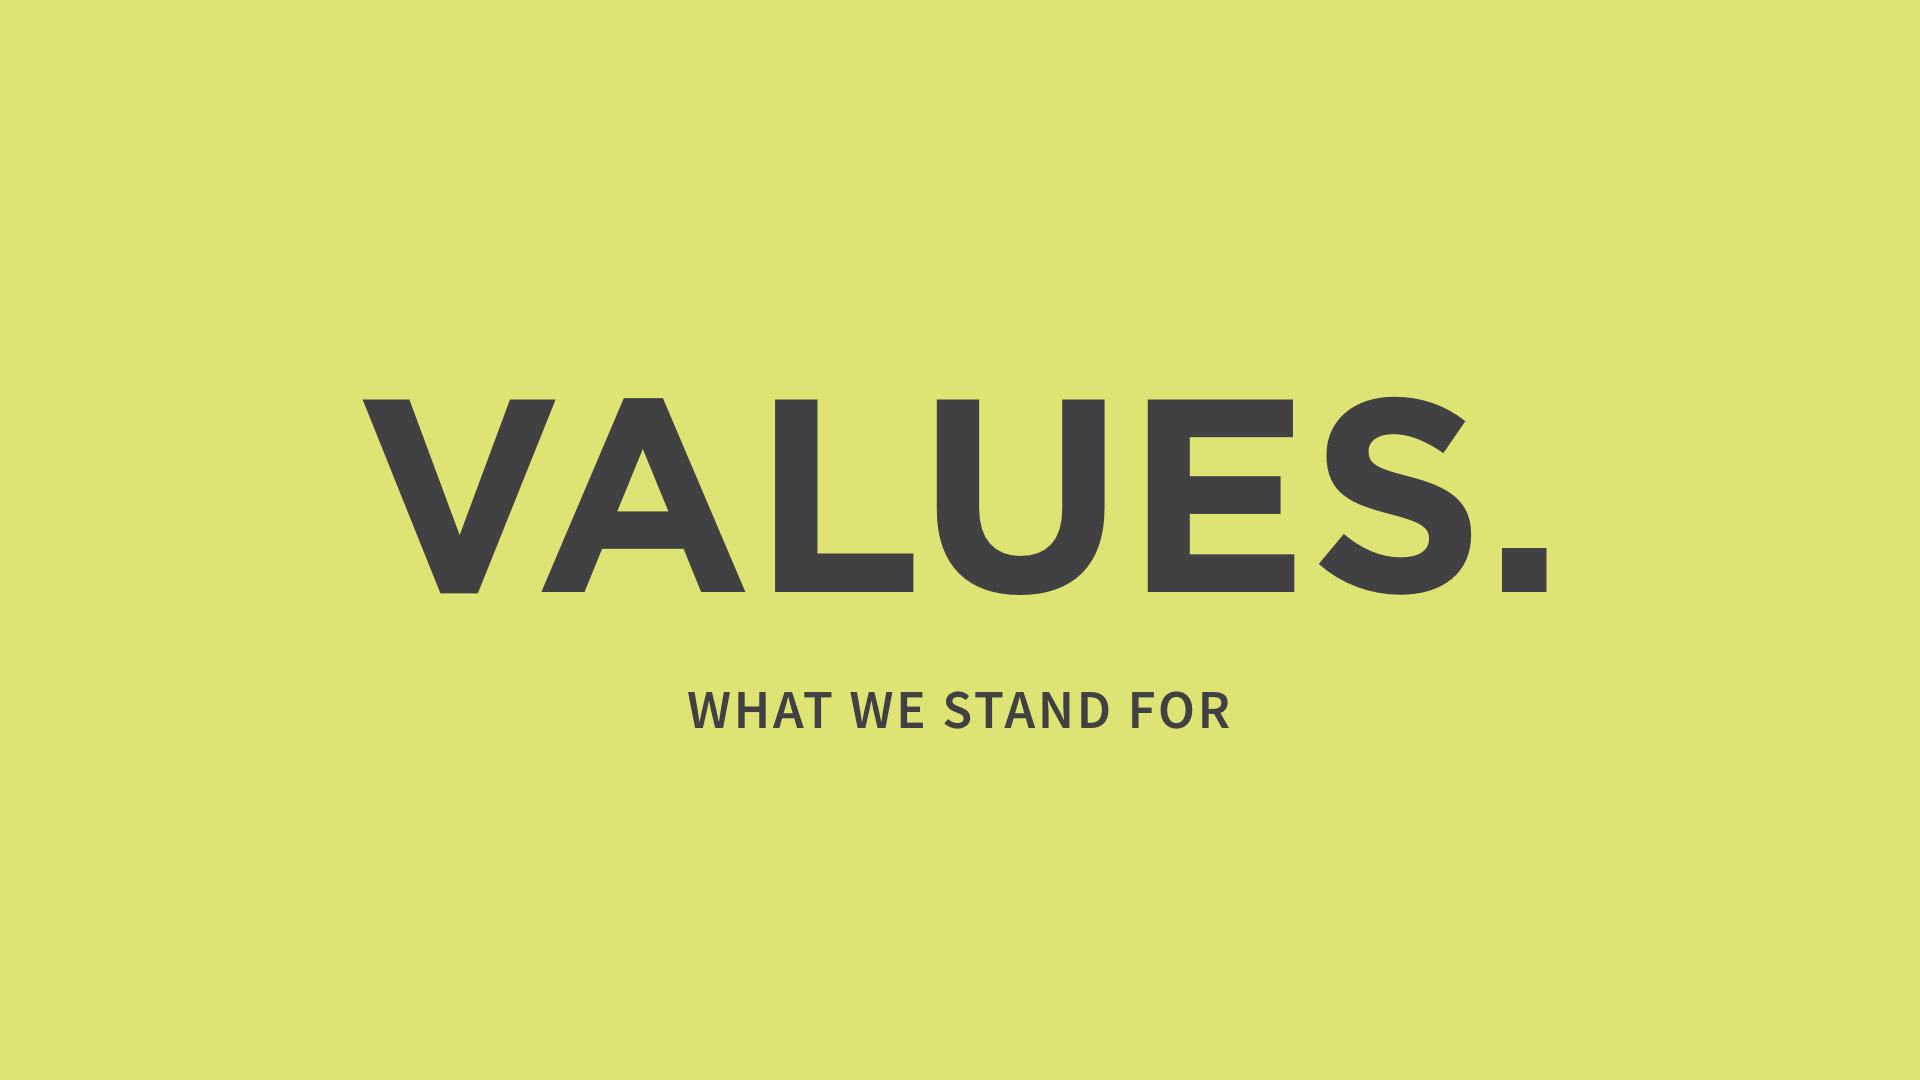 ValuesSeries-whatwestandfor.jpeg.001.jpeg